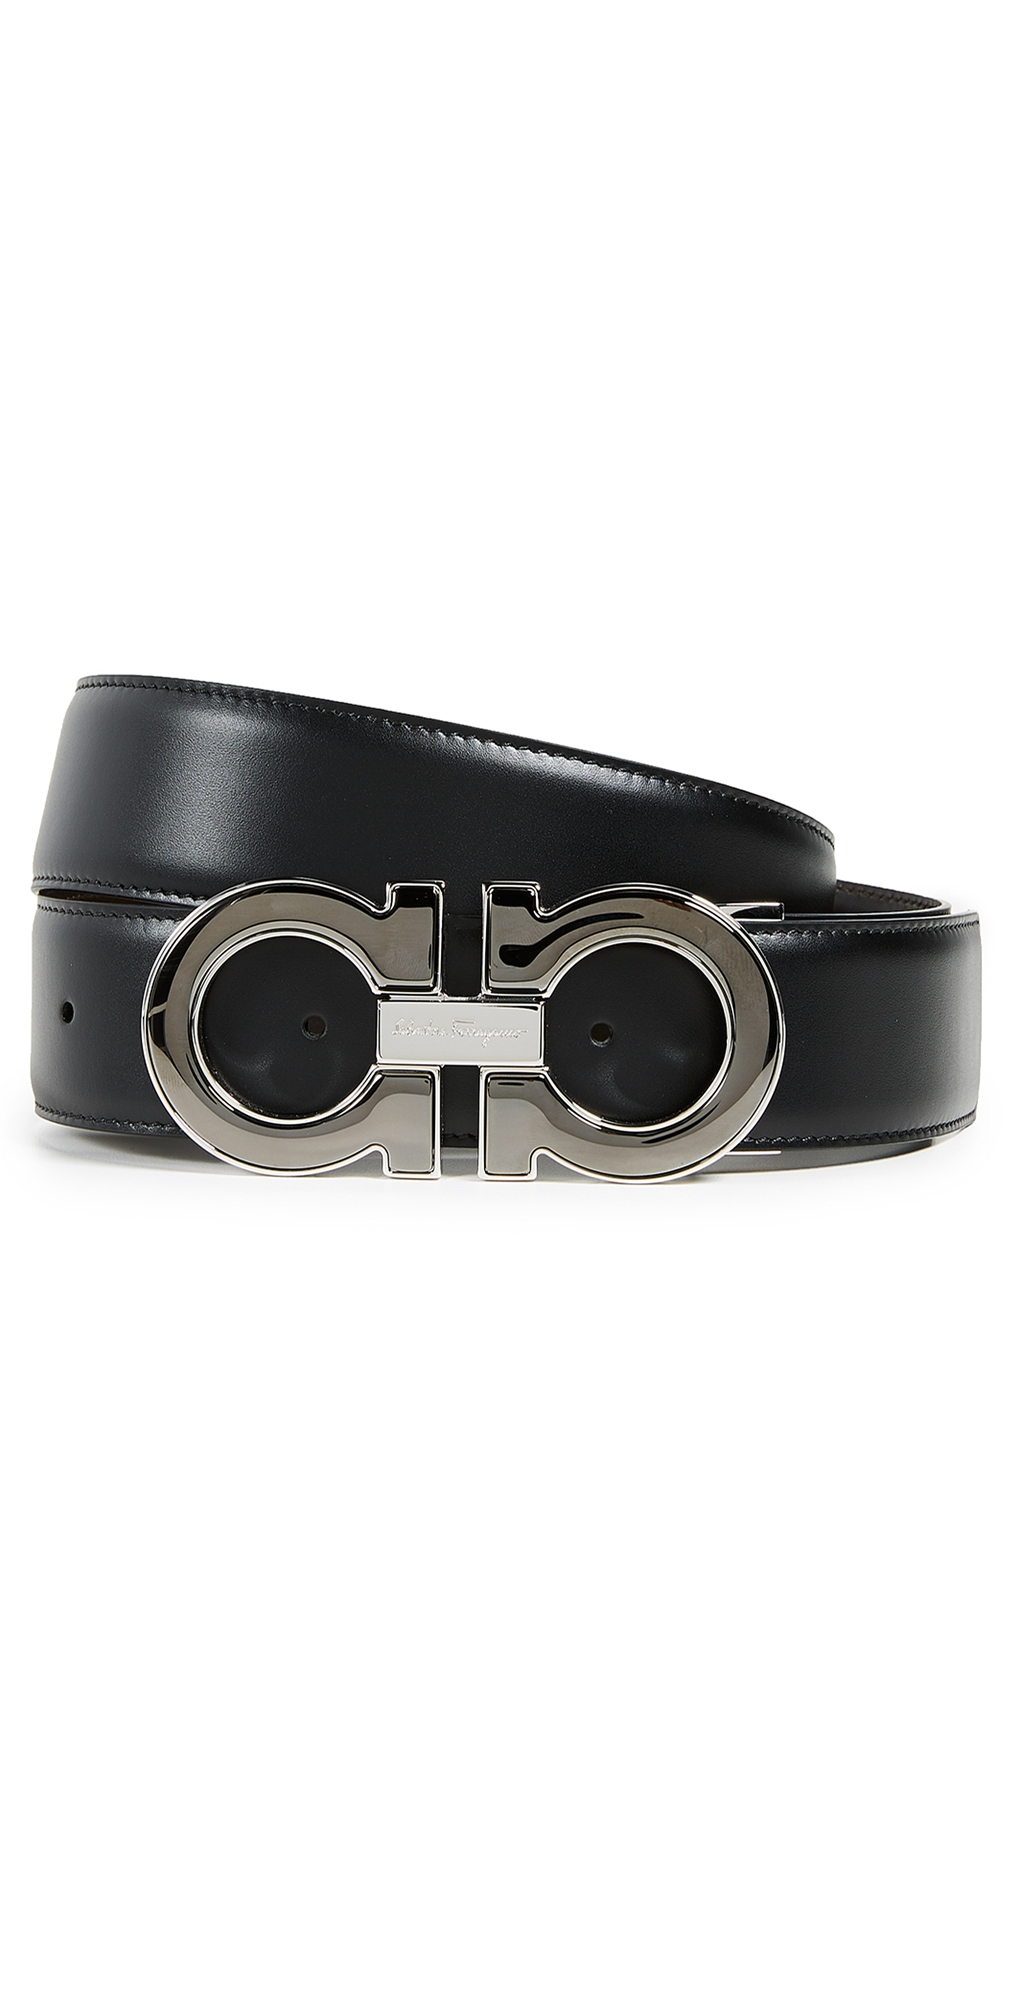 Salvatore Ferragamo Large Double Gancio Reversible Belt